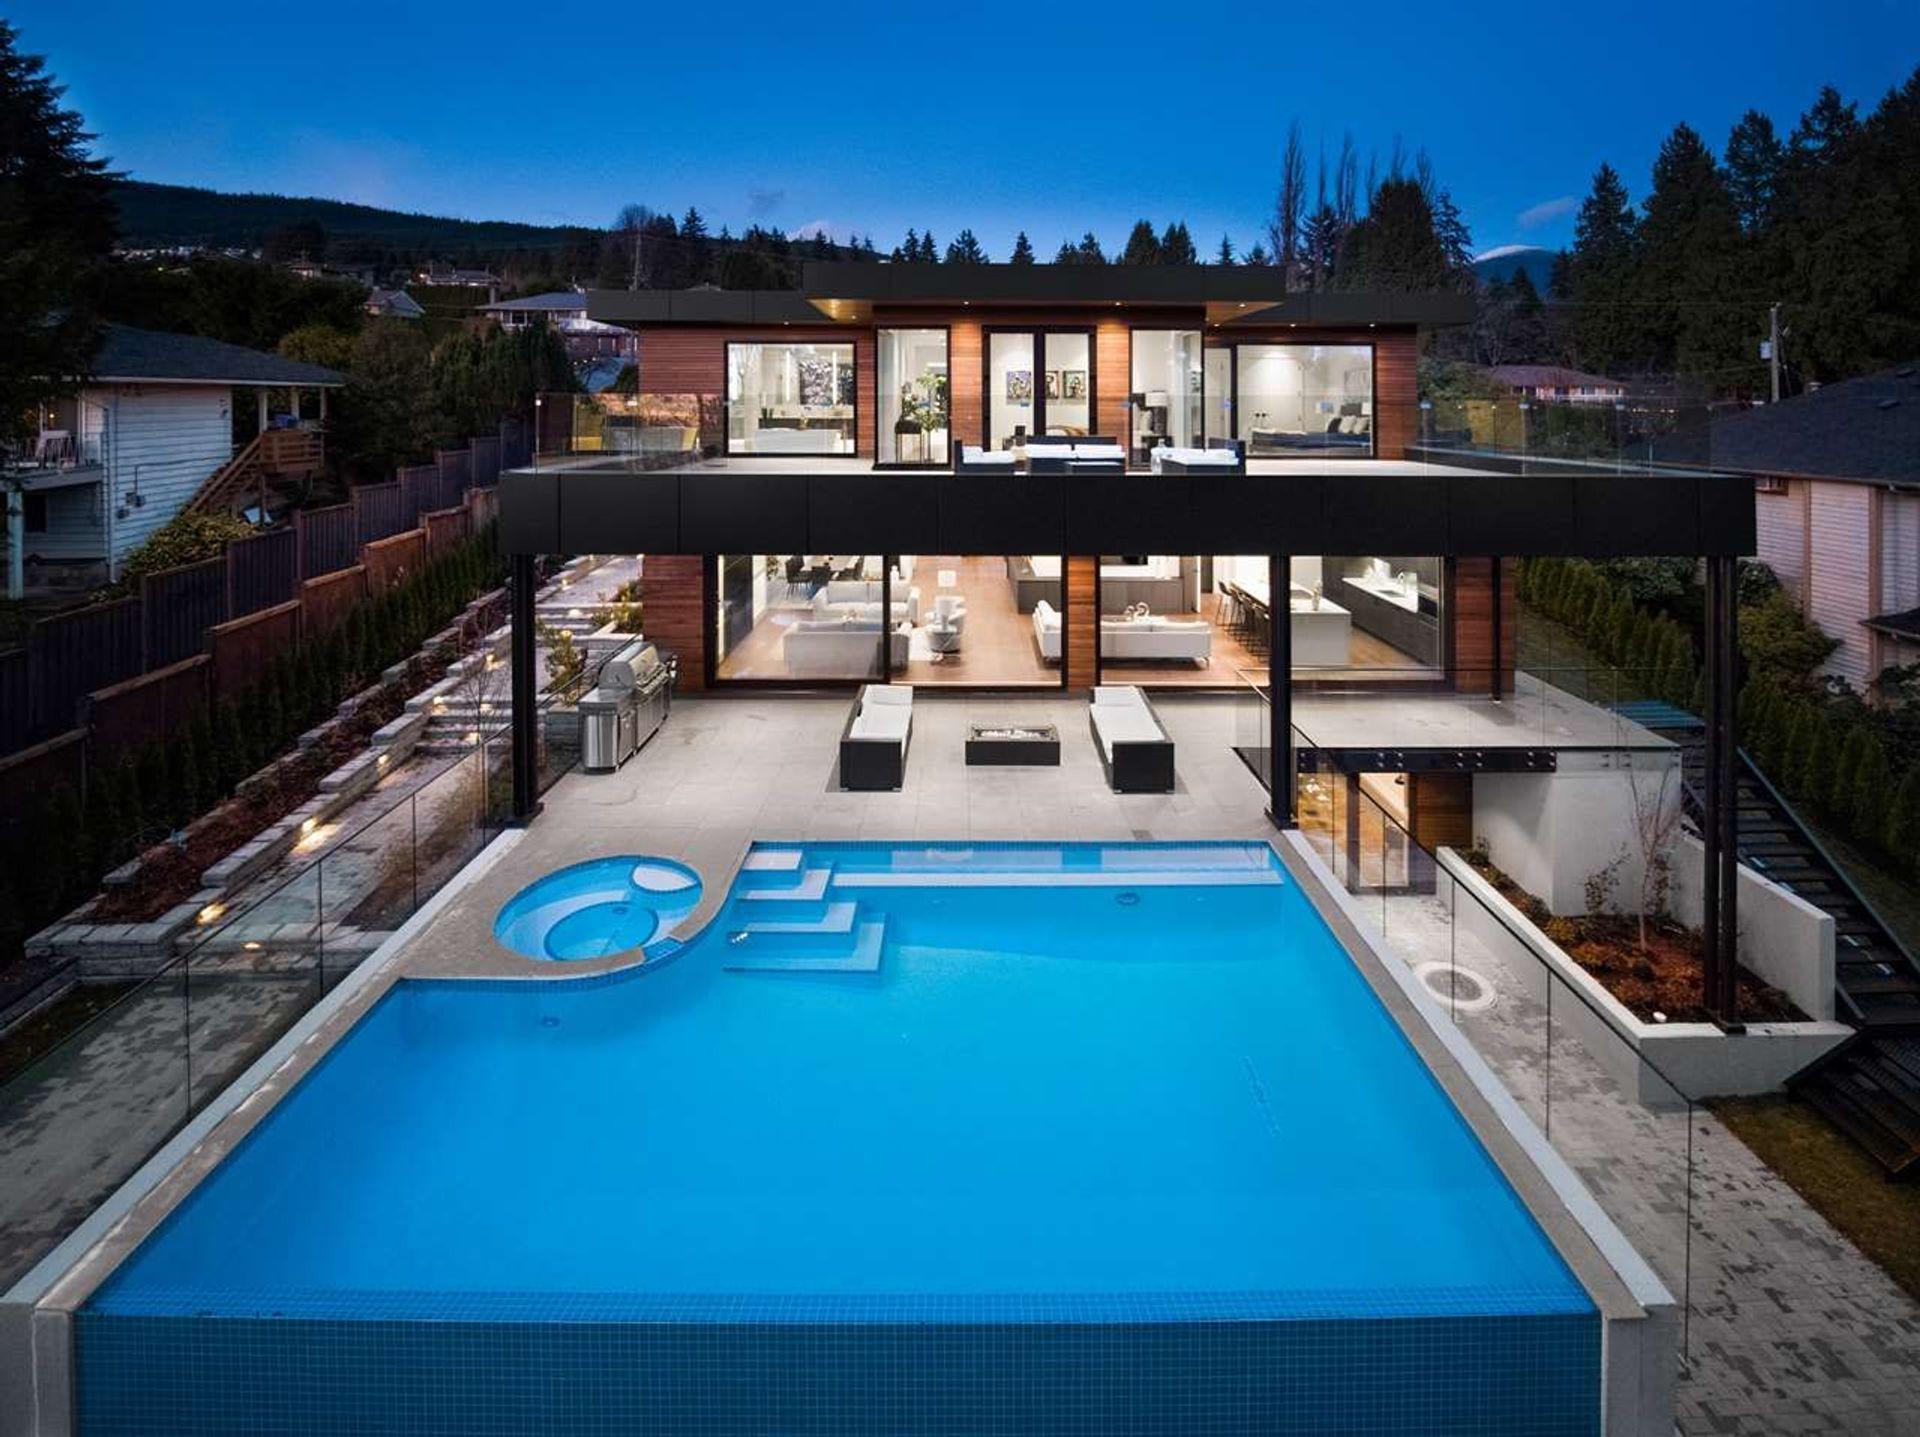 1040-wildwood-lane-british-properties-west-vancouver-03 at 1040 Wildwood Lane, British Properties, West Vancouver